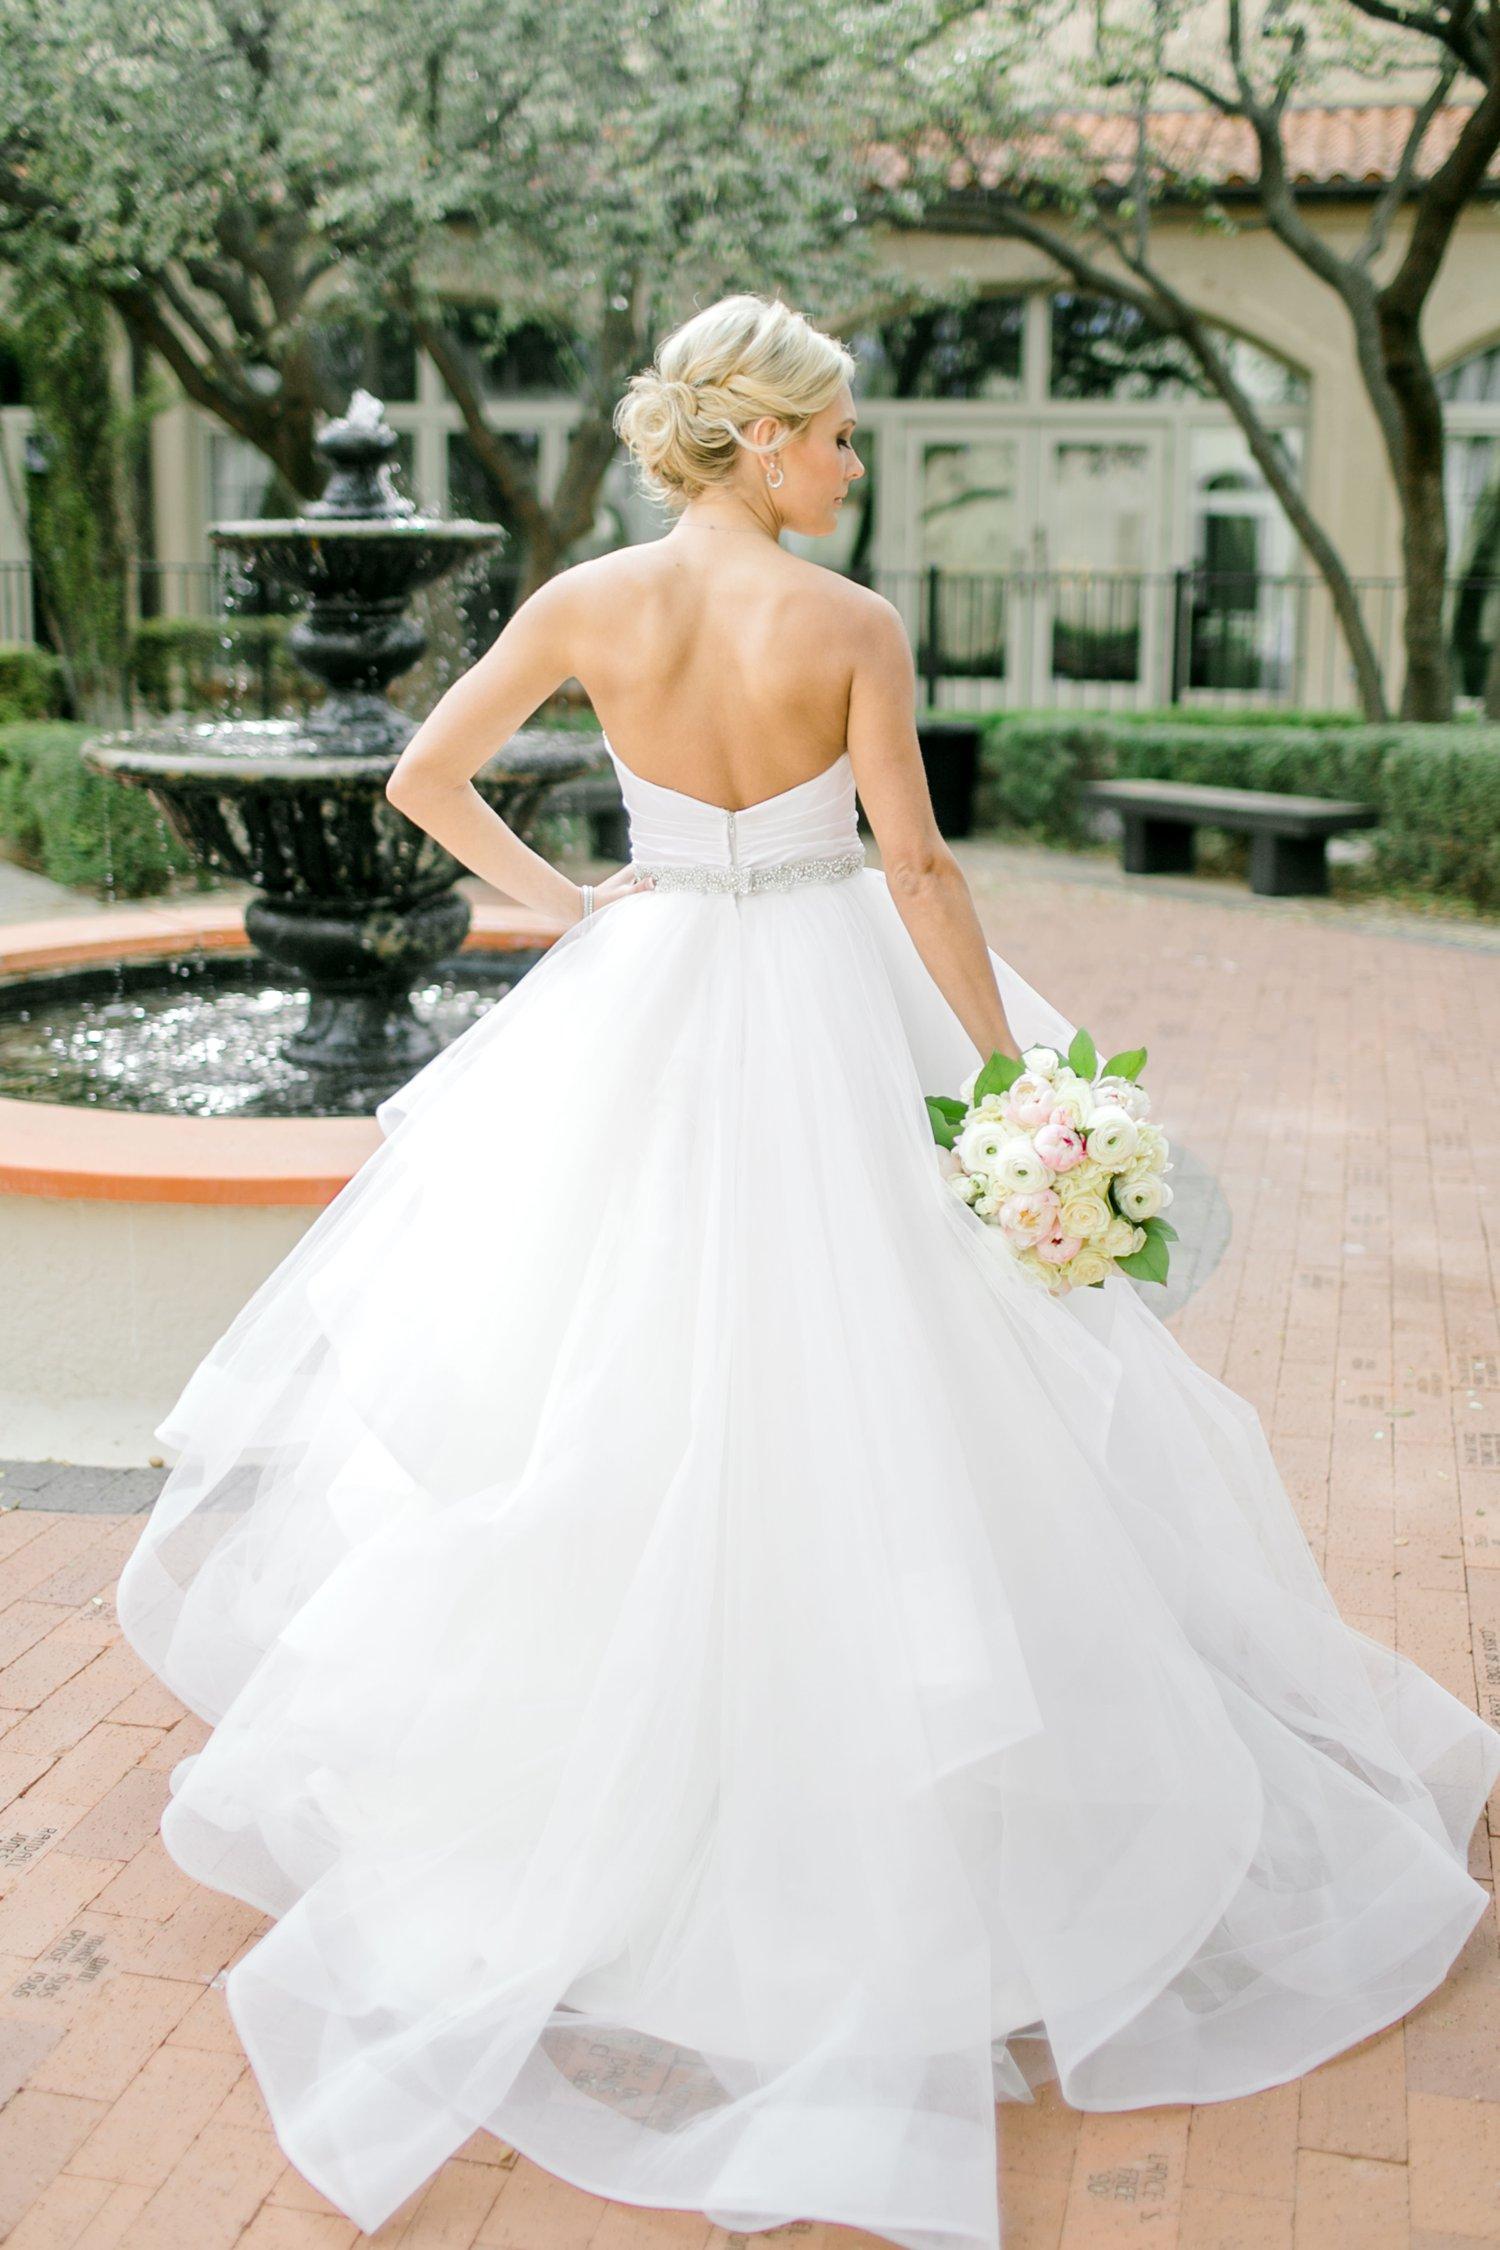 Taylor-Williams-Merket-Alumni-Center-Texas-Tech-Weddings-Lubbock-Photographer_0014.jpg